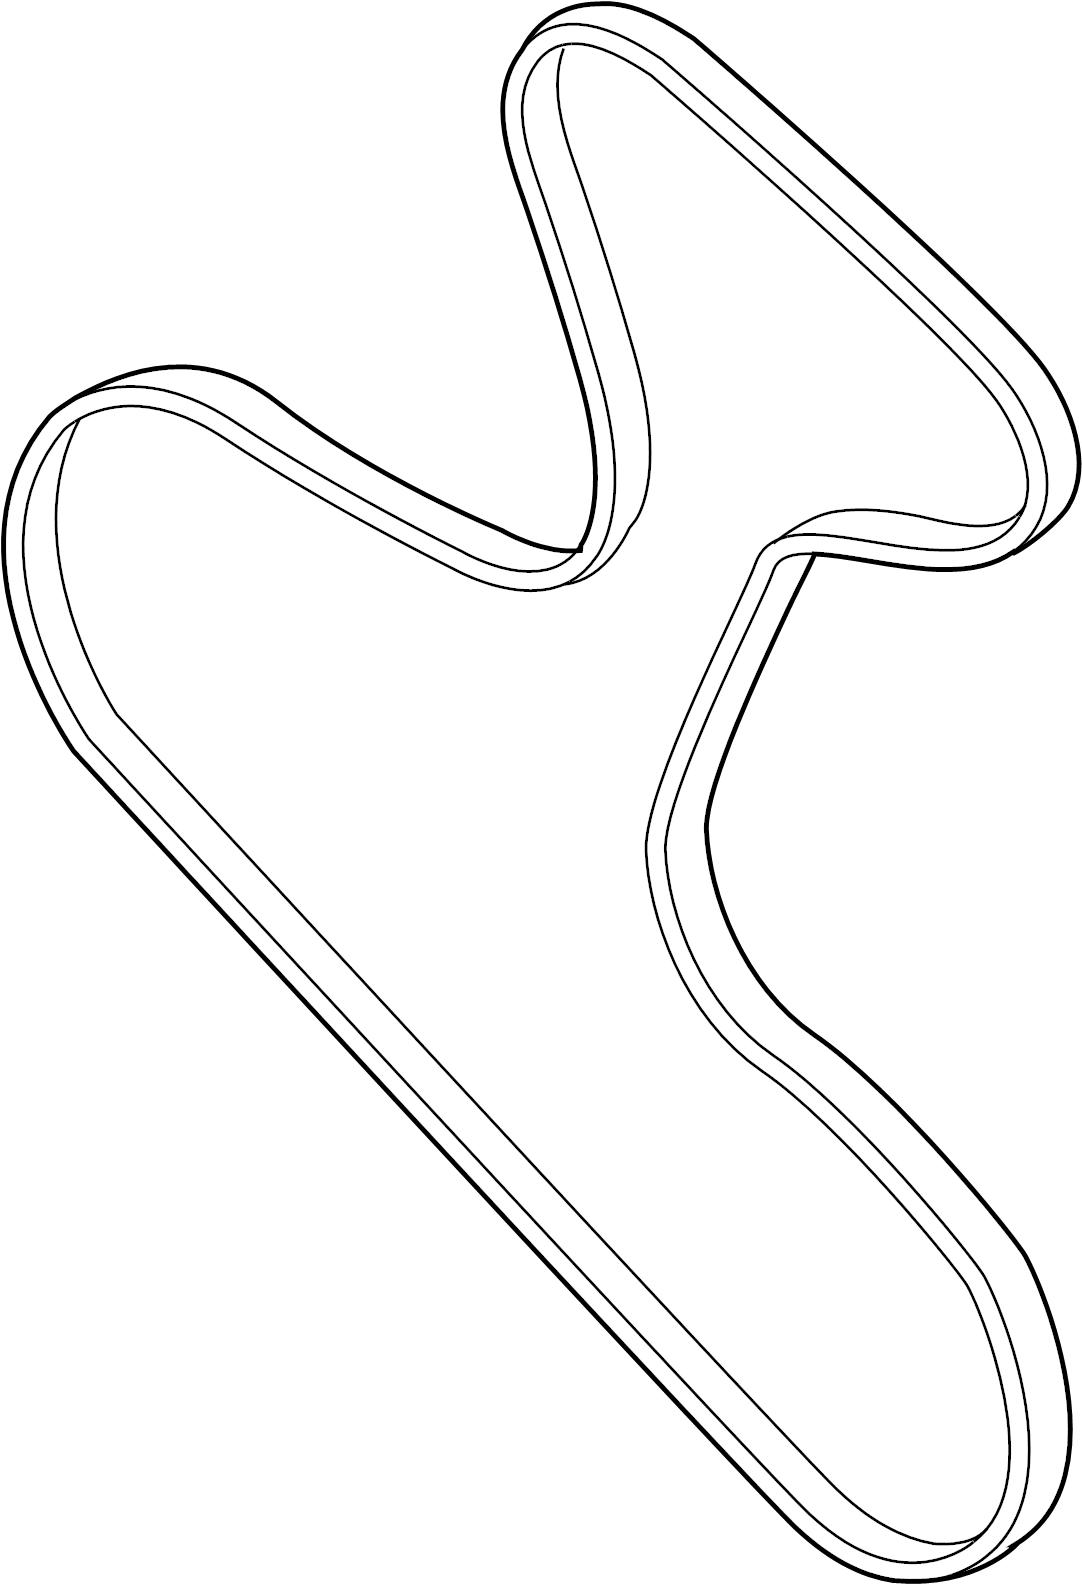 Volkswagen Doublebelt Serpentine Belt 3 2 Liter 3